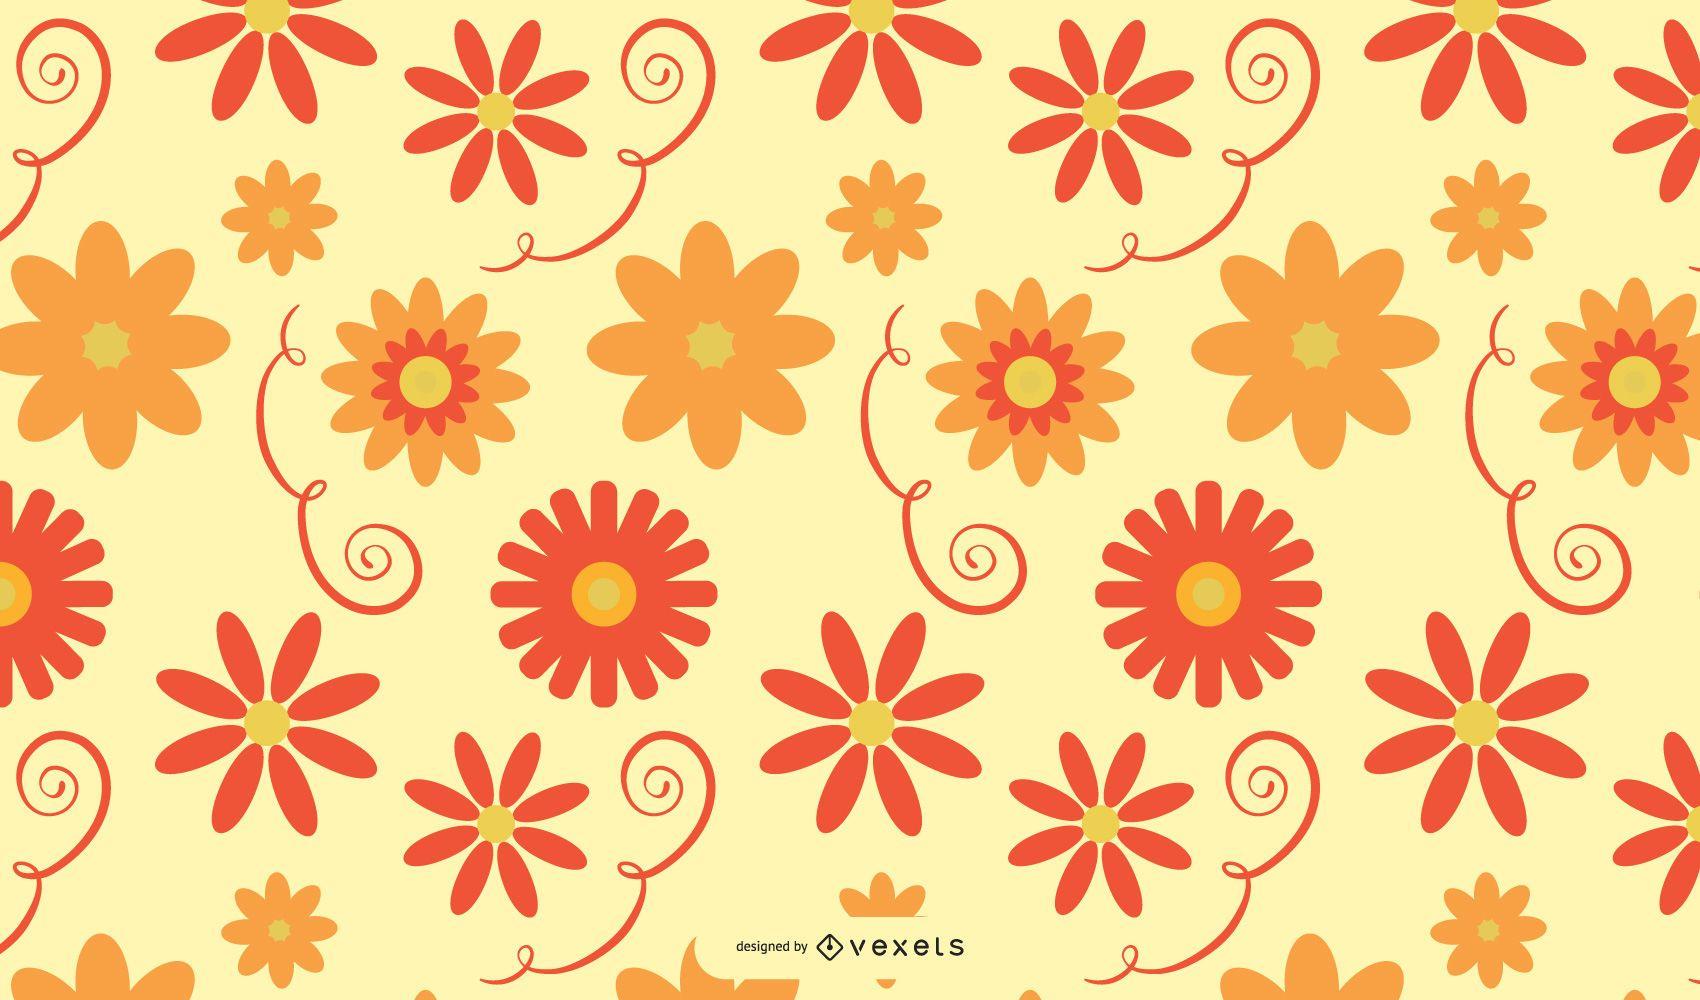 Swirls and Flowers Background